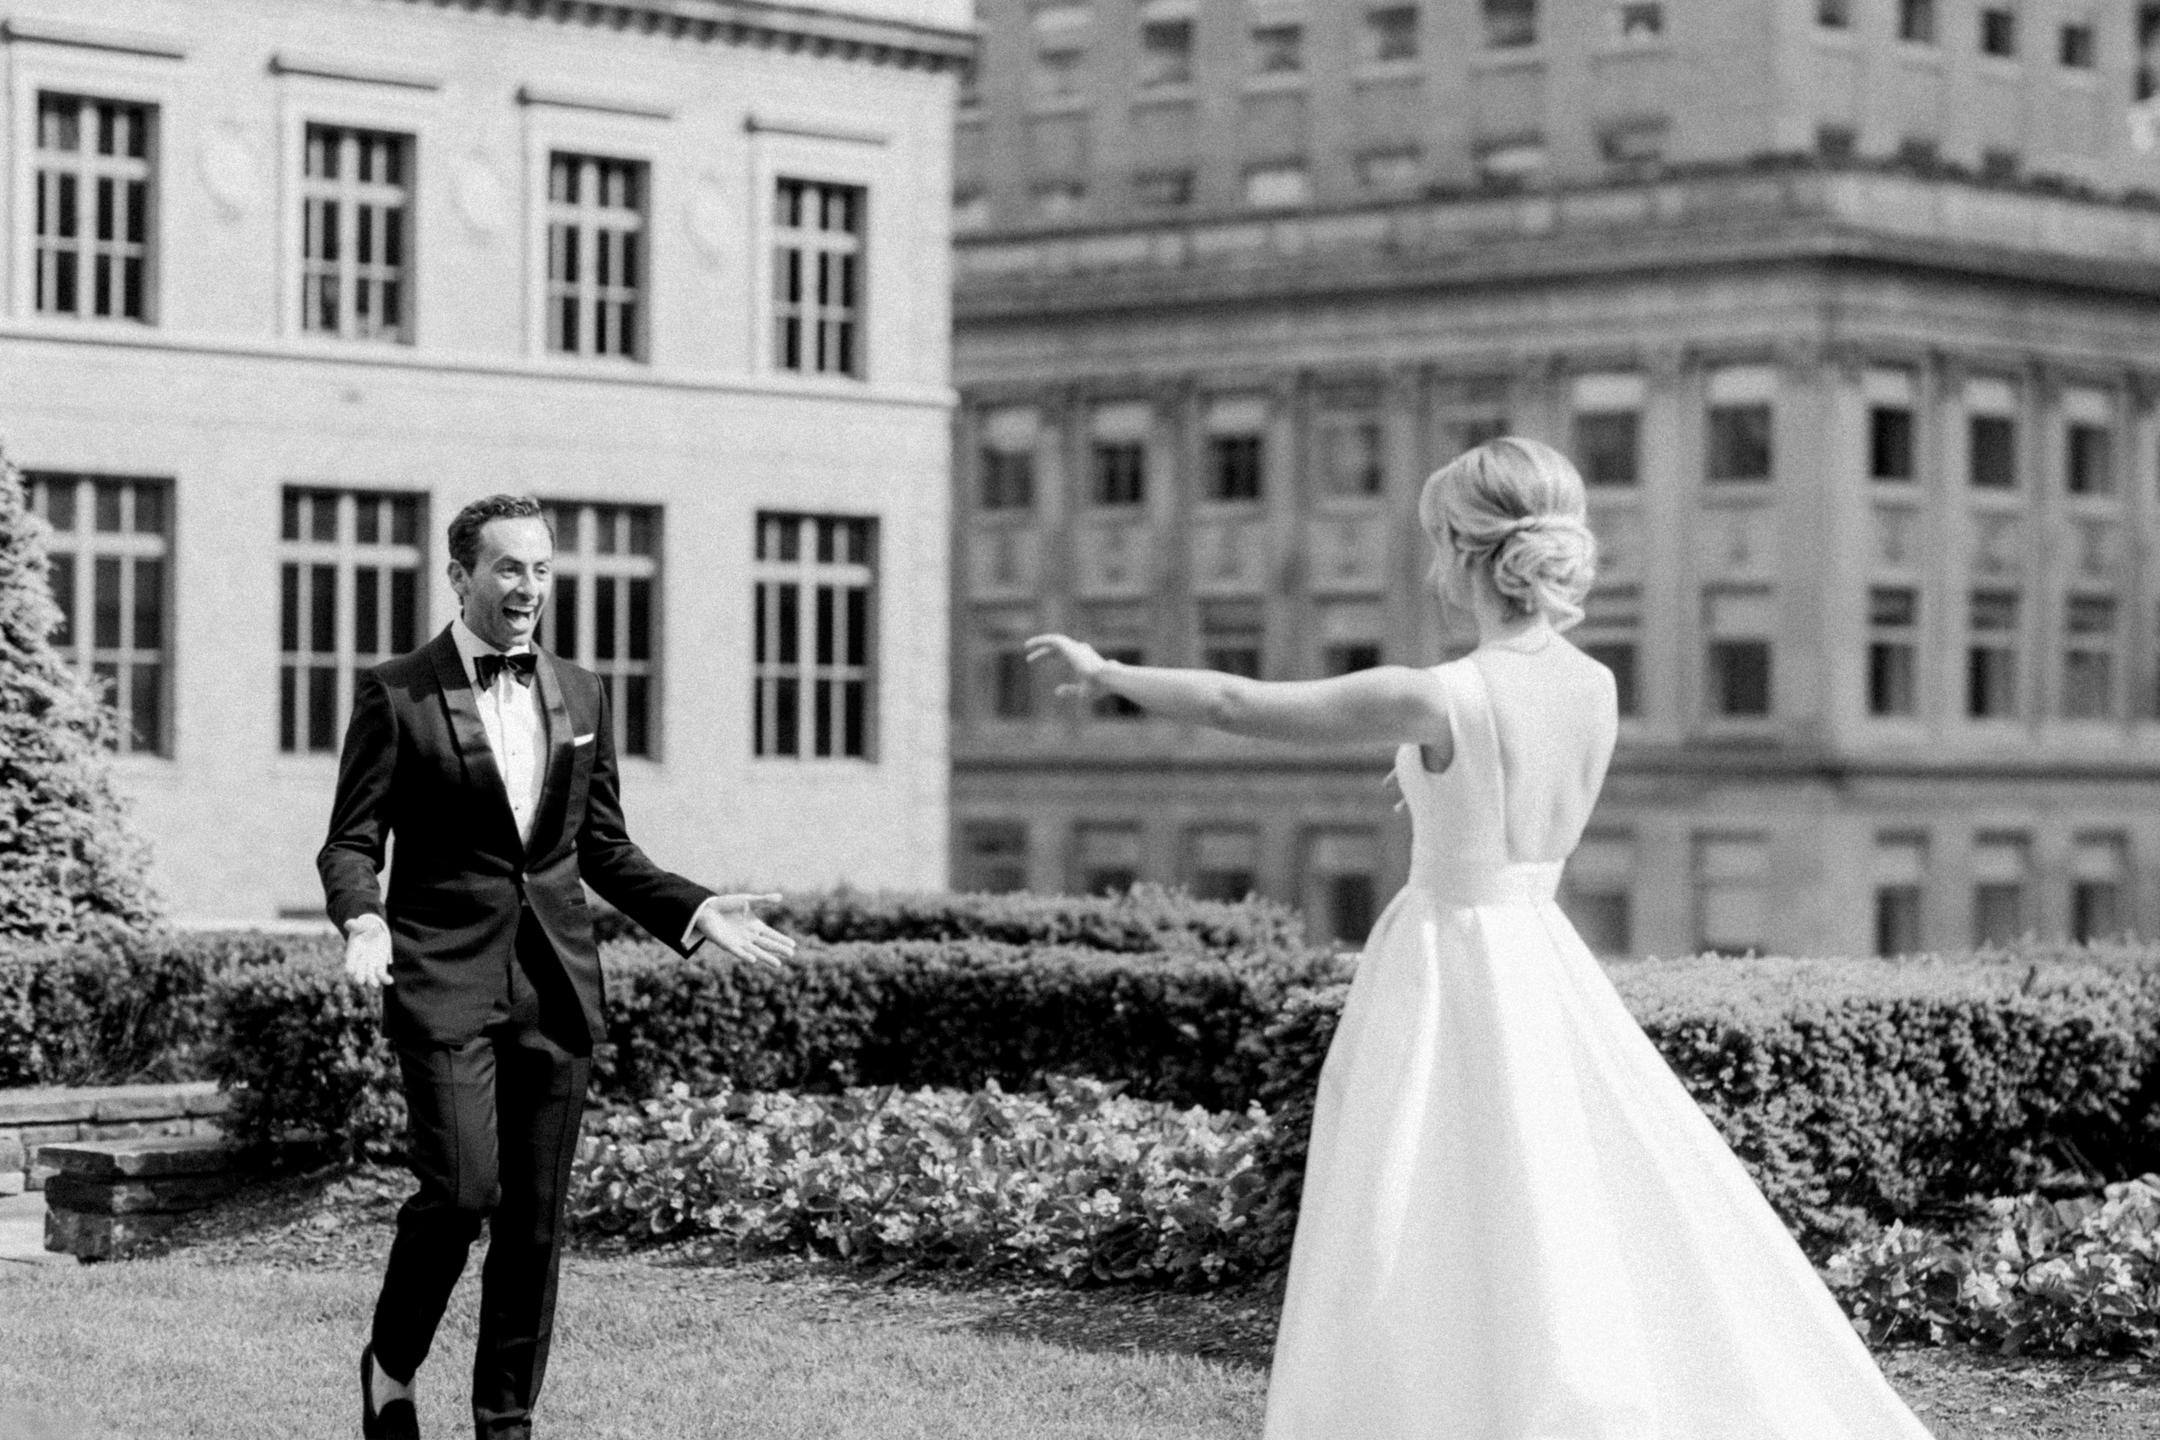 ALEXIS + ANDREW'S WEDDING TEASERS